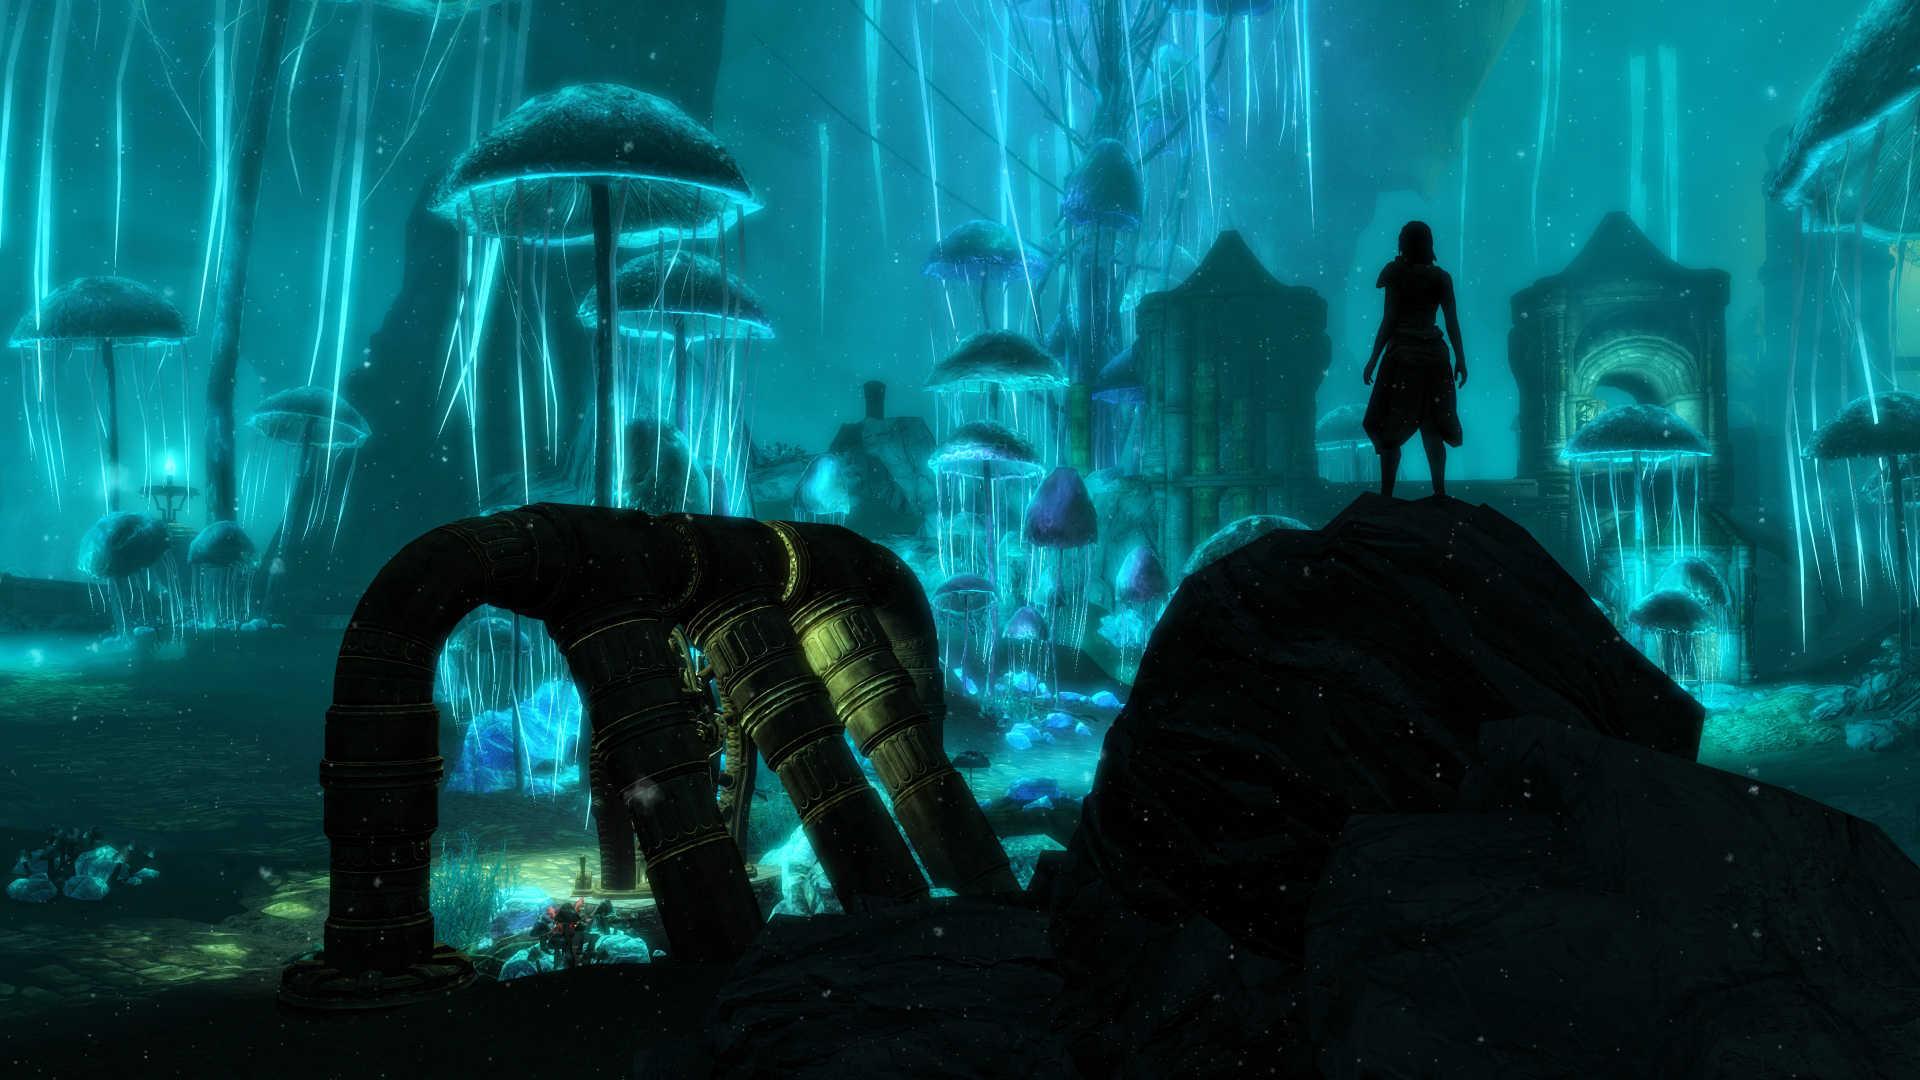 Wallpaper The Elder Scrolls Heroes Of Skyrim 4k Legends